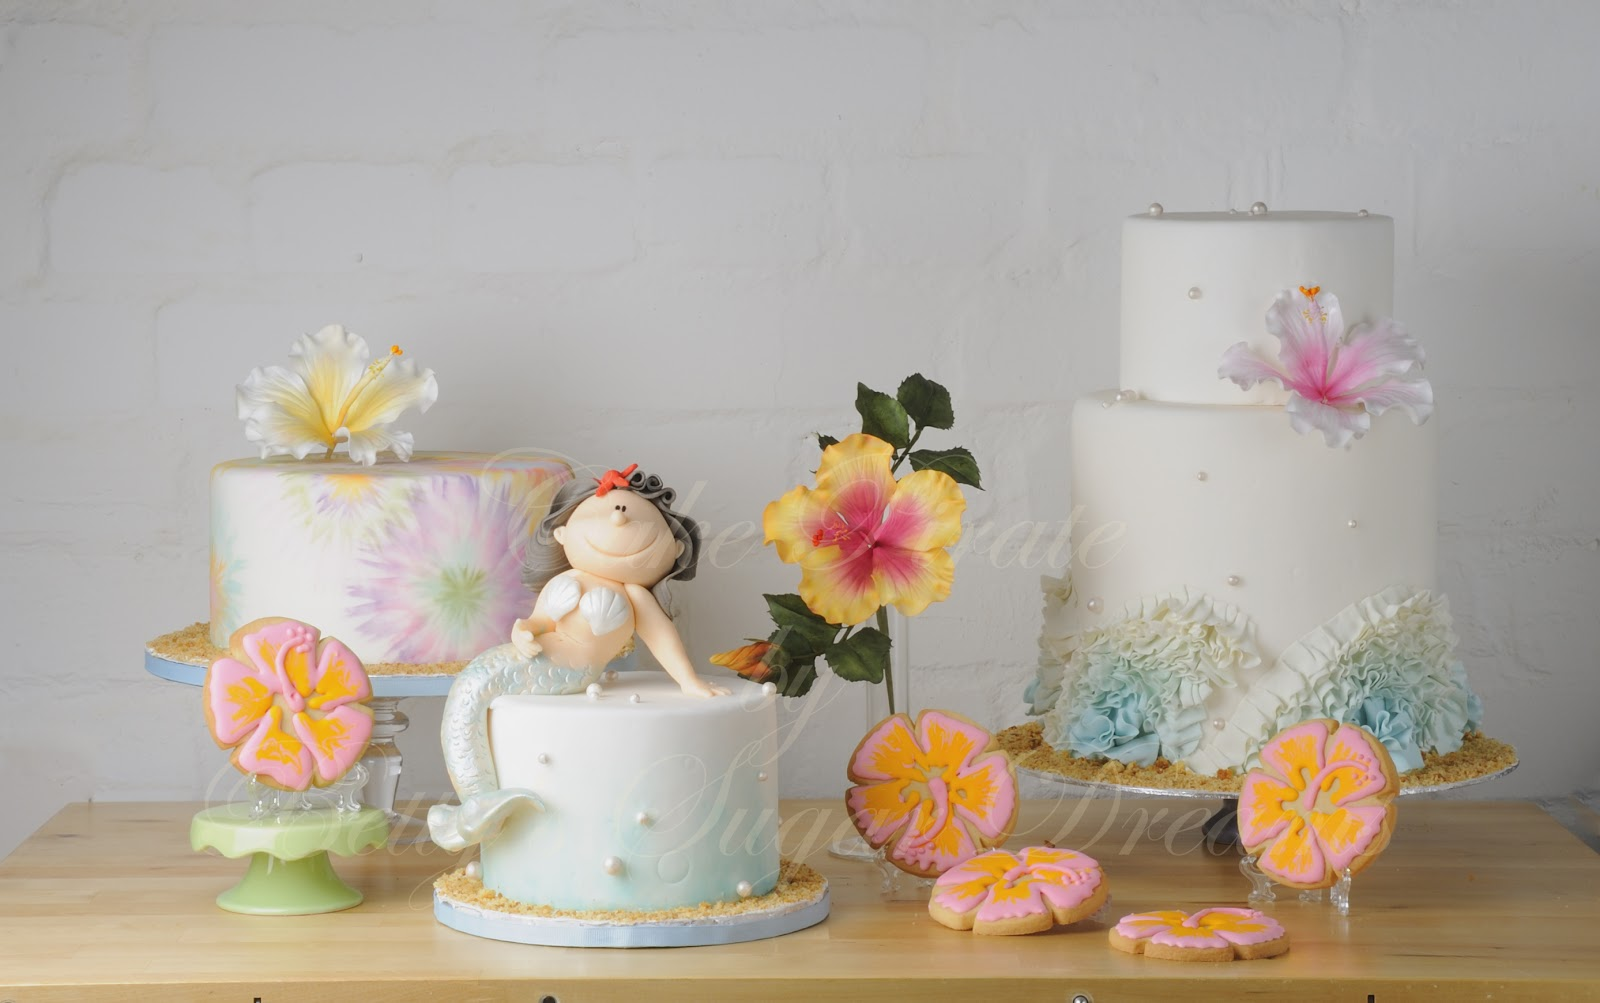 Cake Art Spezial Zeitschrift : Betty?s Sugardreams - Blog: Januar 2013